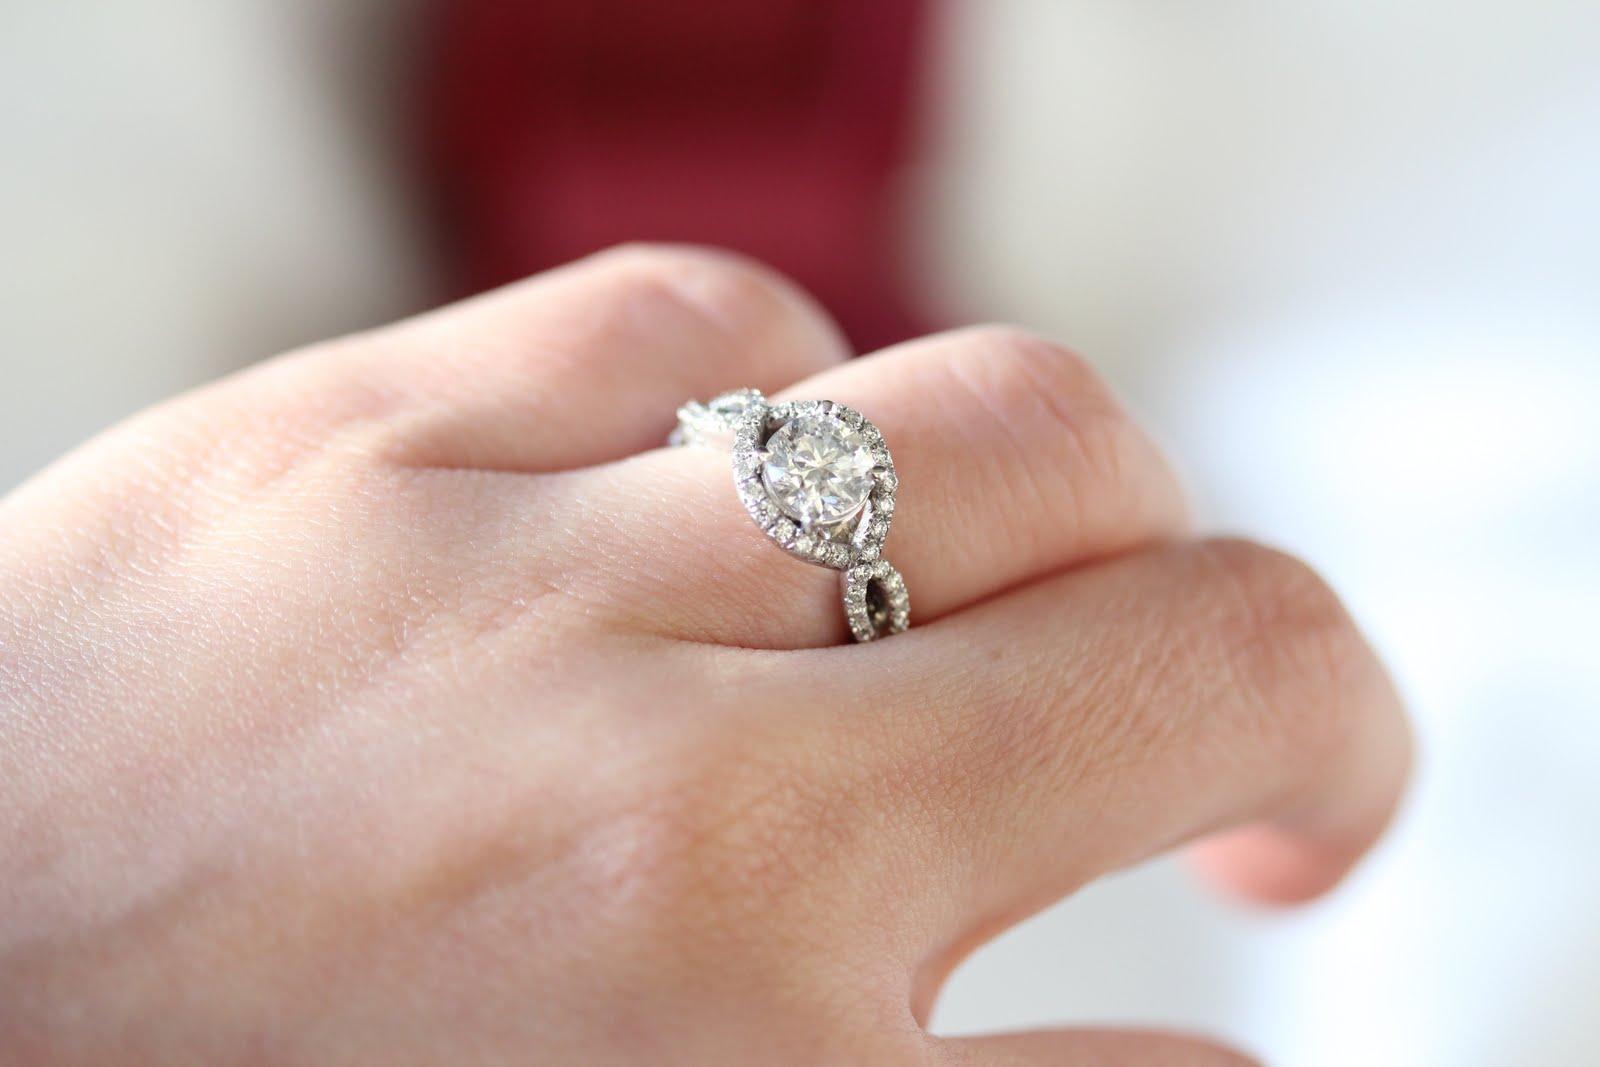 the wedding ring finger 2011 bridal mehndi designs On wedding ring finger